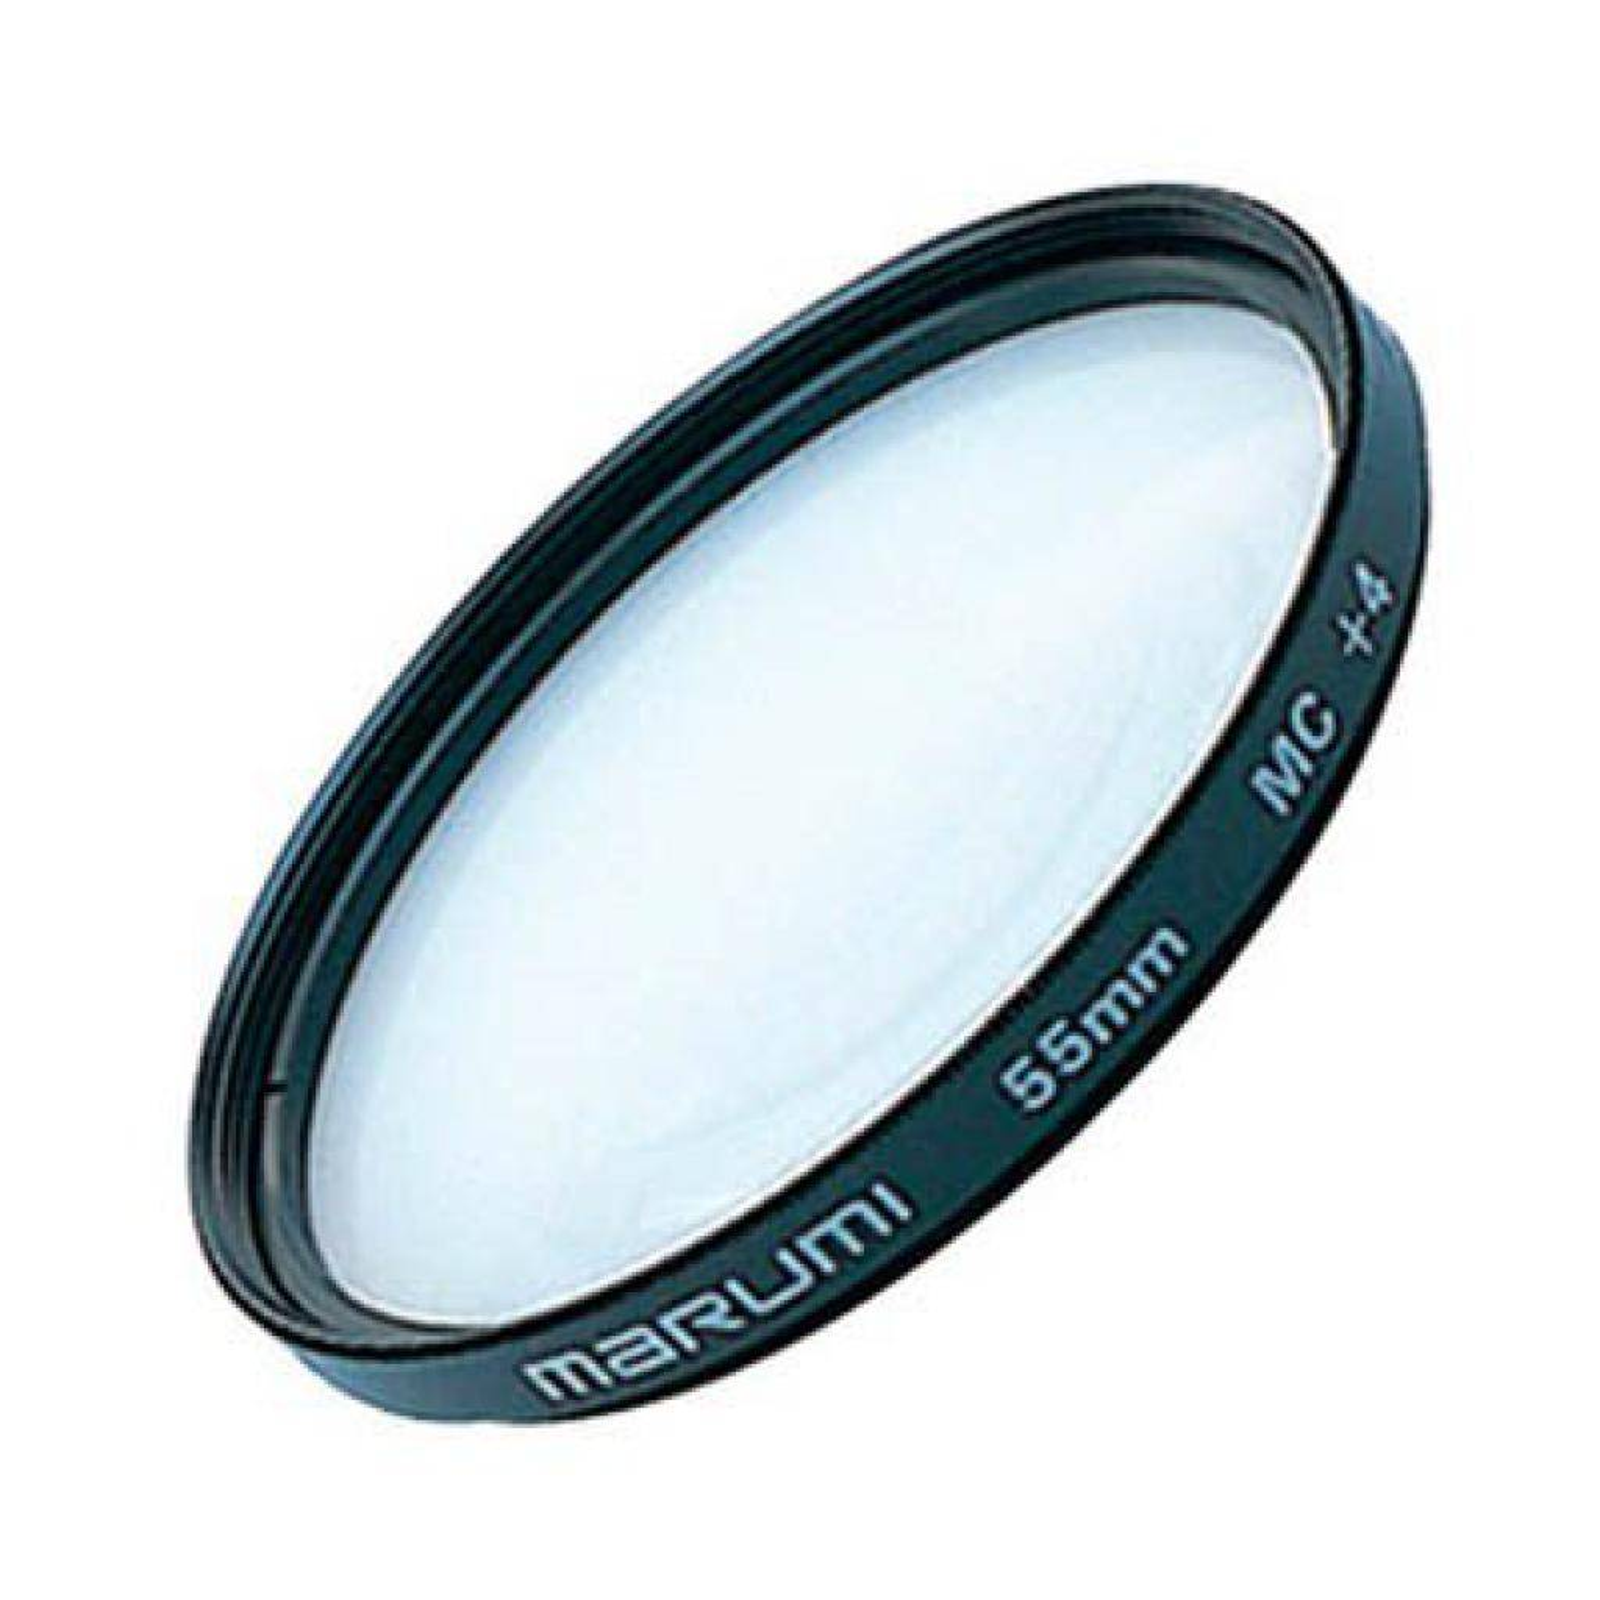 Светофильтр Marumi Close-up+4 55mm